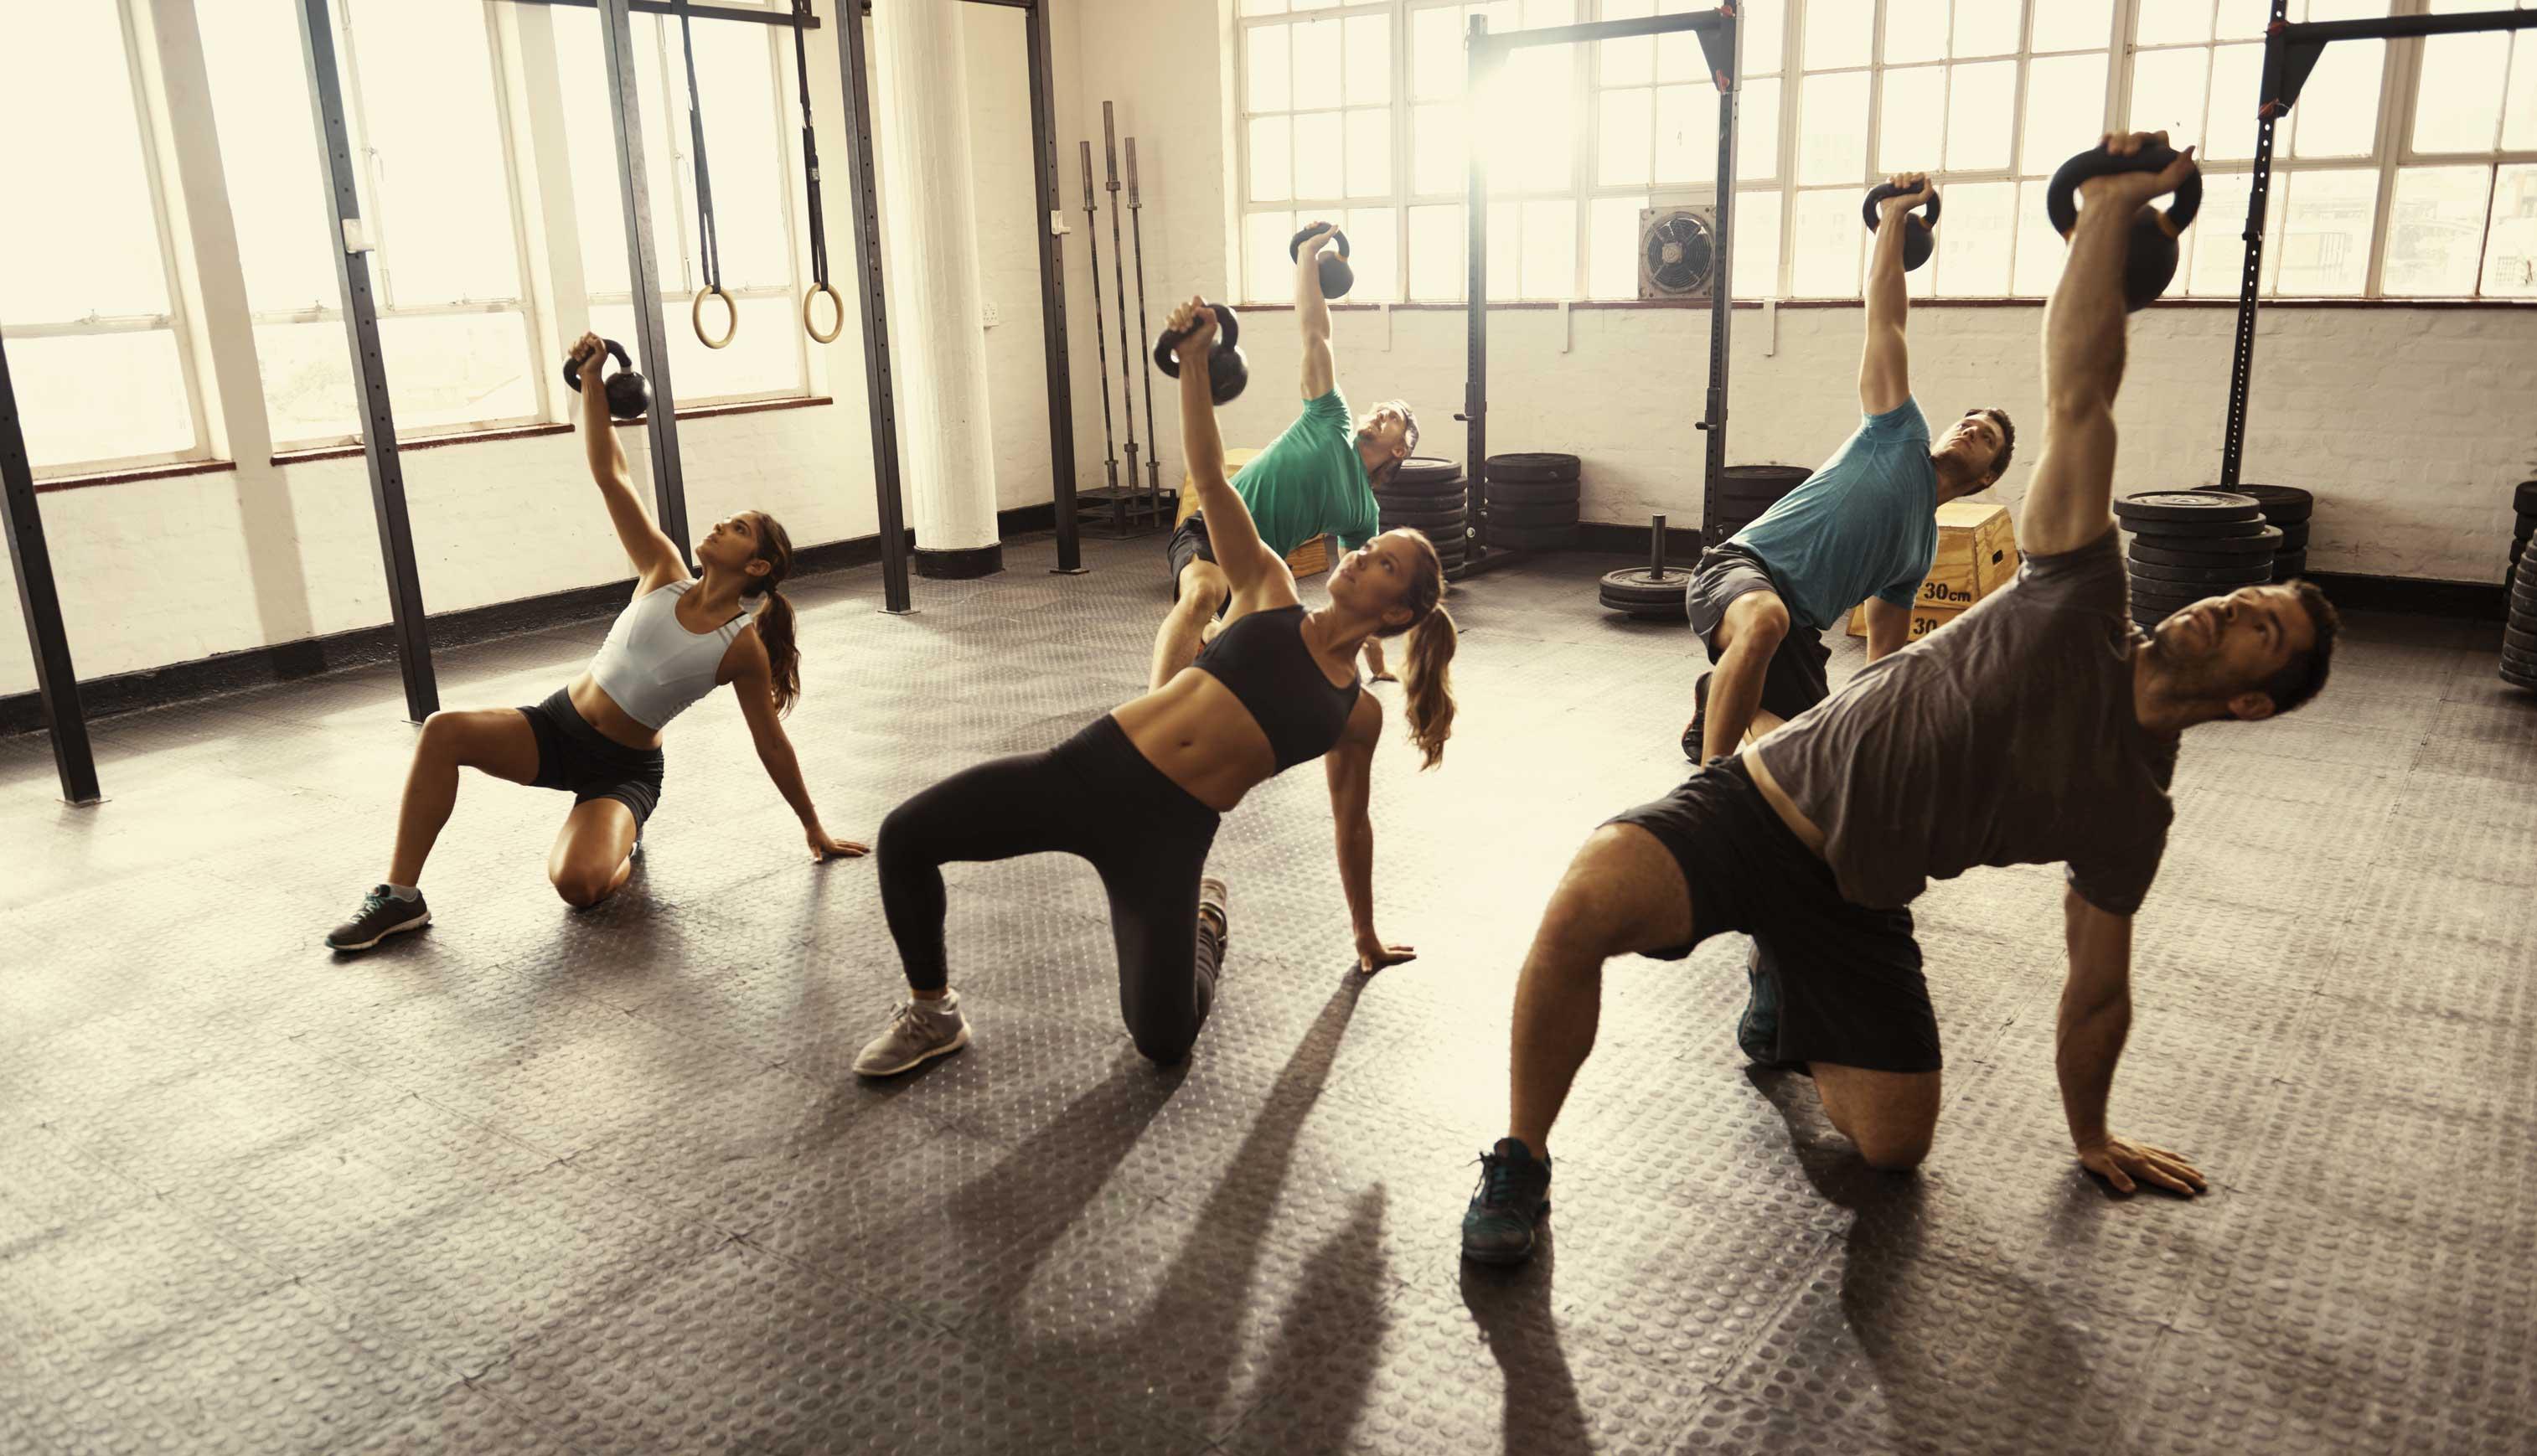 the lean body 90 workout by lean body training london